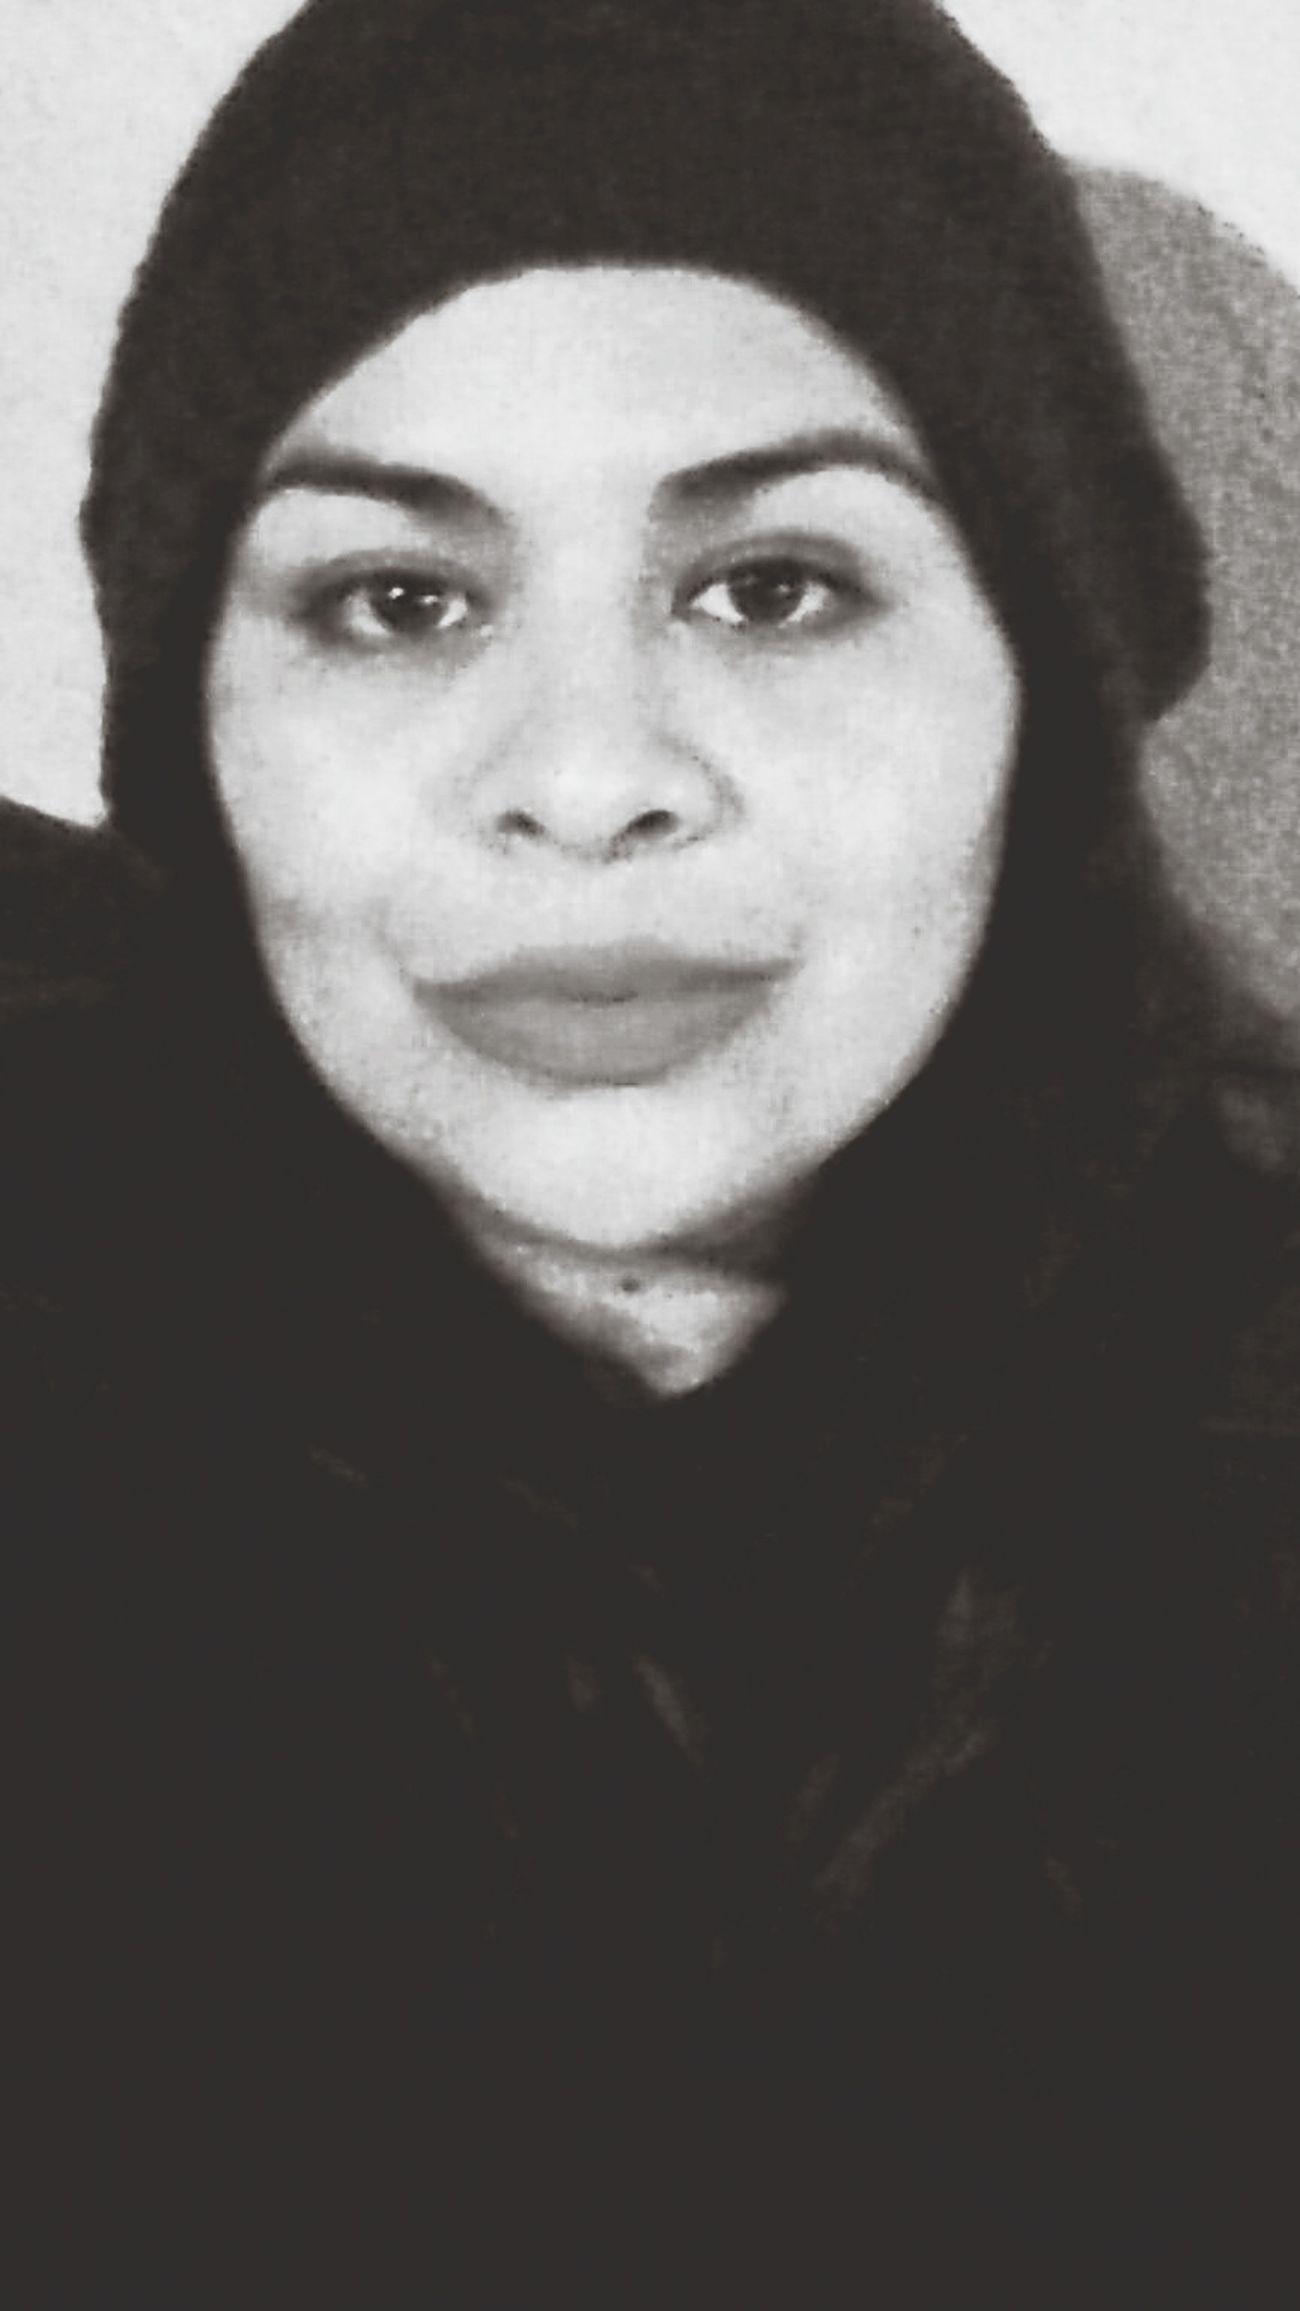 Black & White Selfie ♥ Sexy Lips Kiss Me Baby ❤ Shut Up And Kiss Me:*